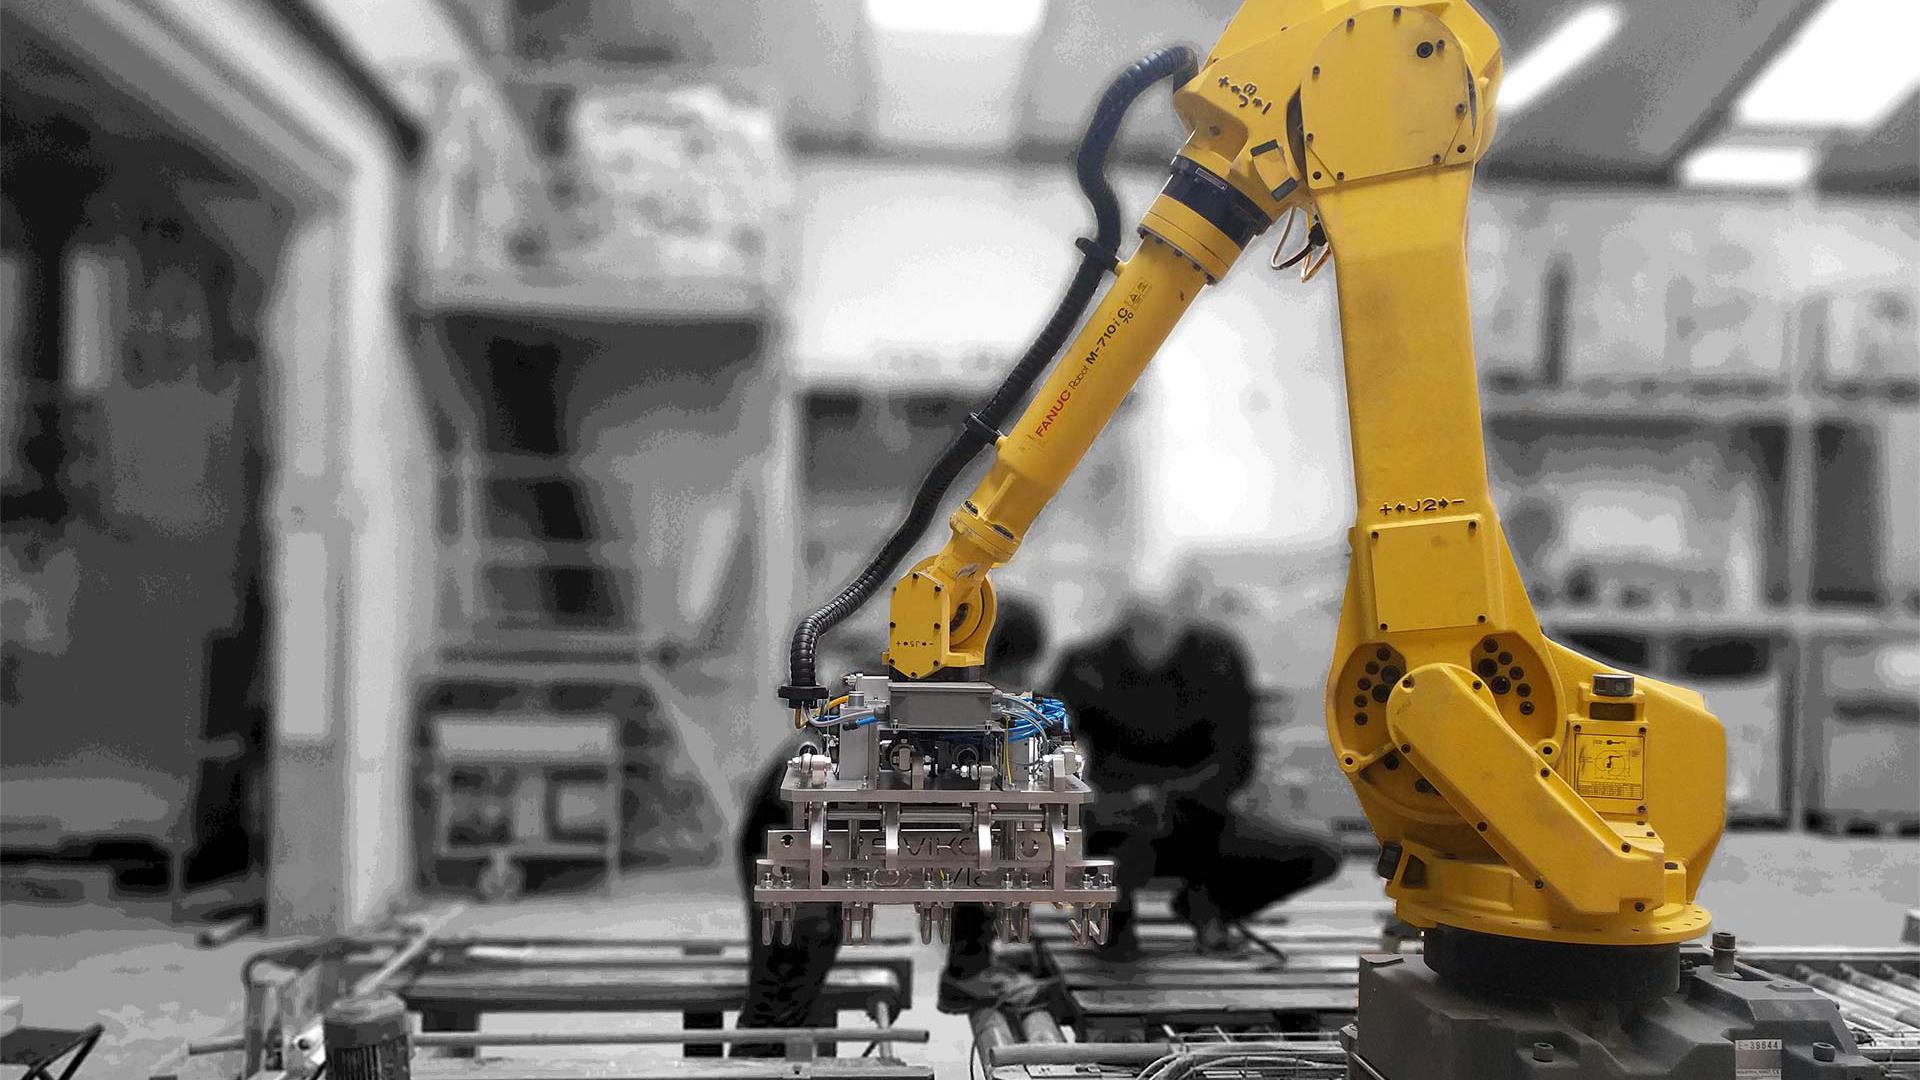 Industrial palletizing robot by Siviko